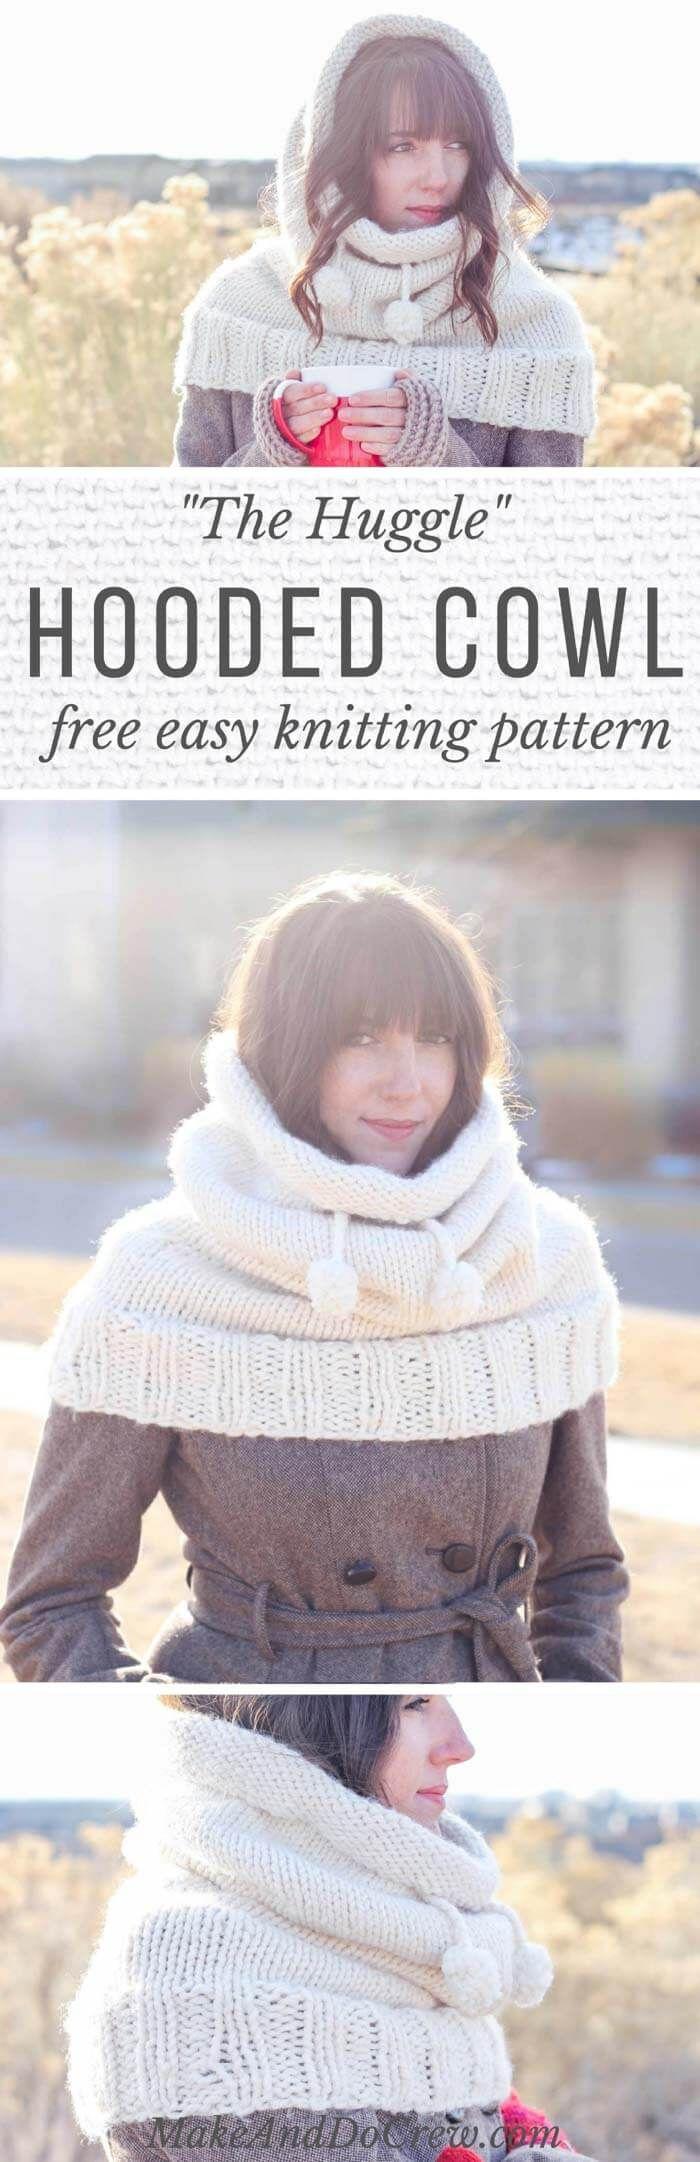 The Huggle\' Hooded Cowl – Free Knitting Pattern | Pinterest | Hooded ...